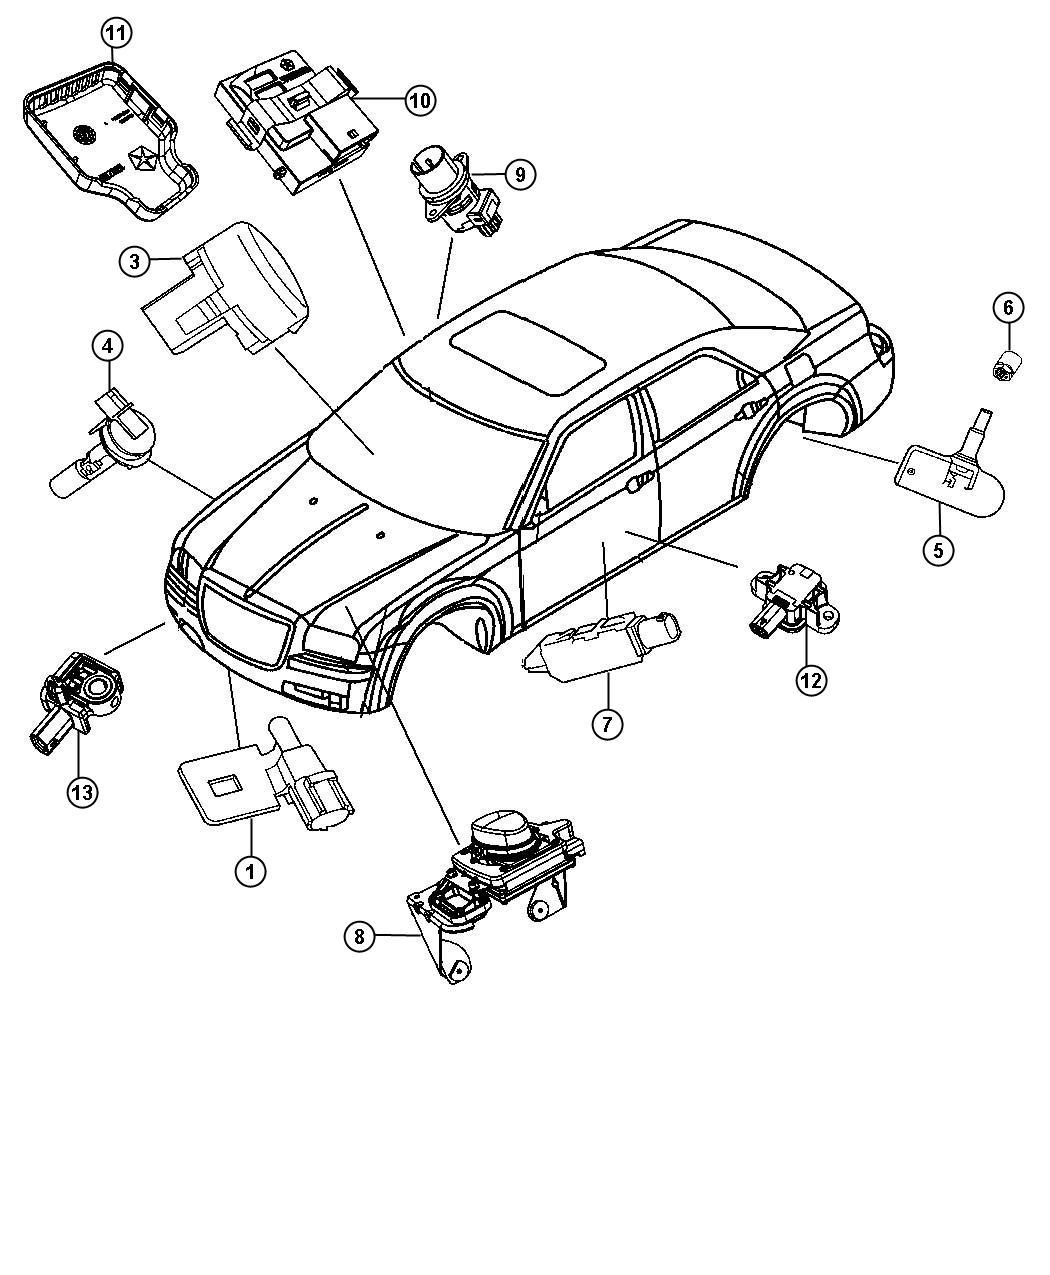 Chrysler 300 Used For Sensor And Bracket Adaptive Speed